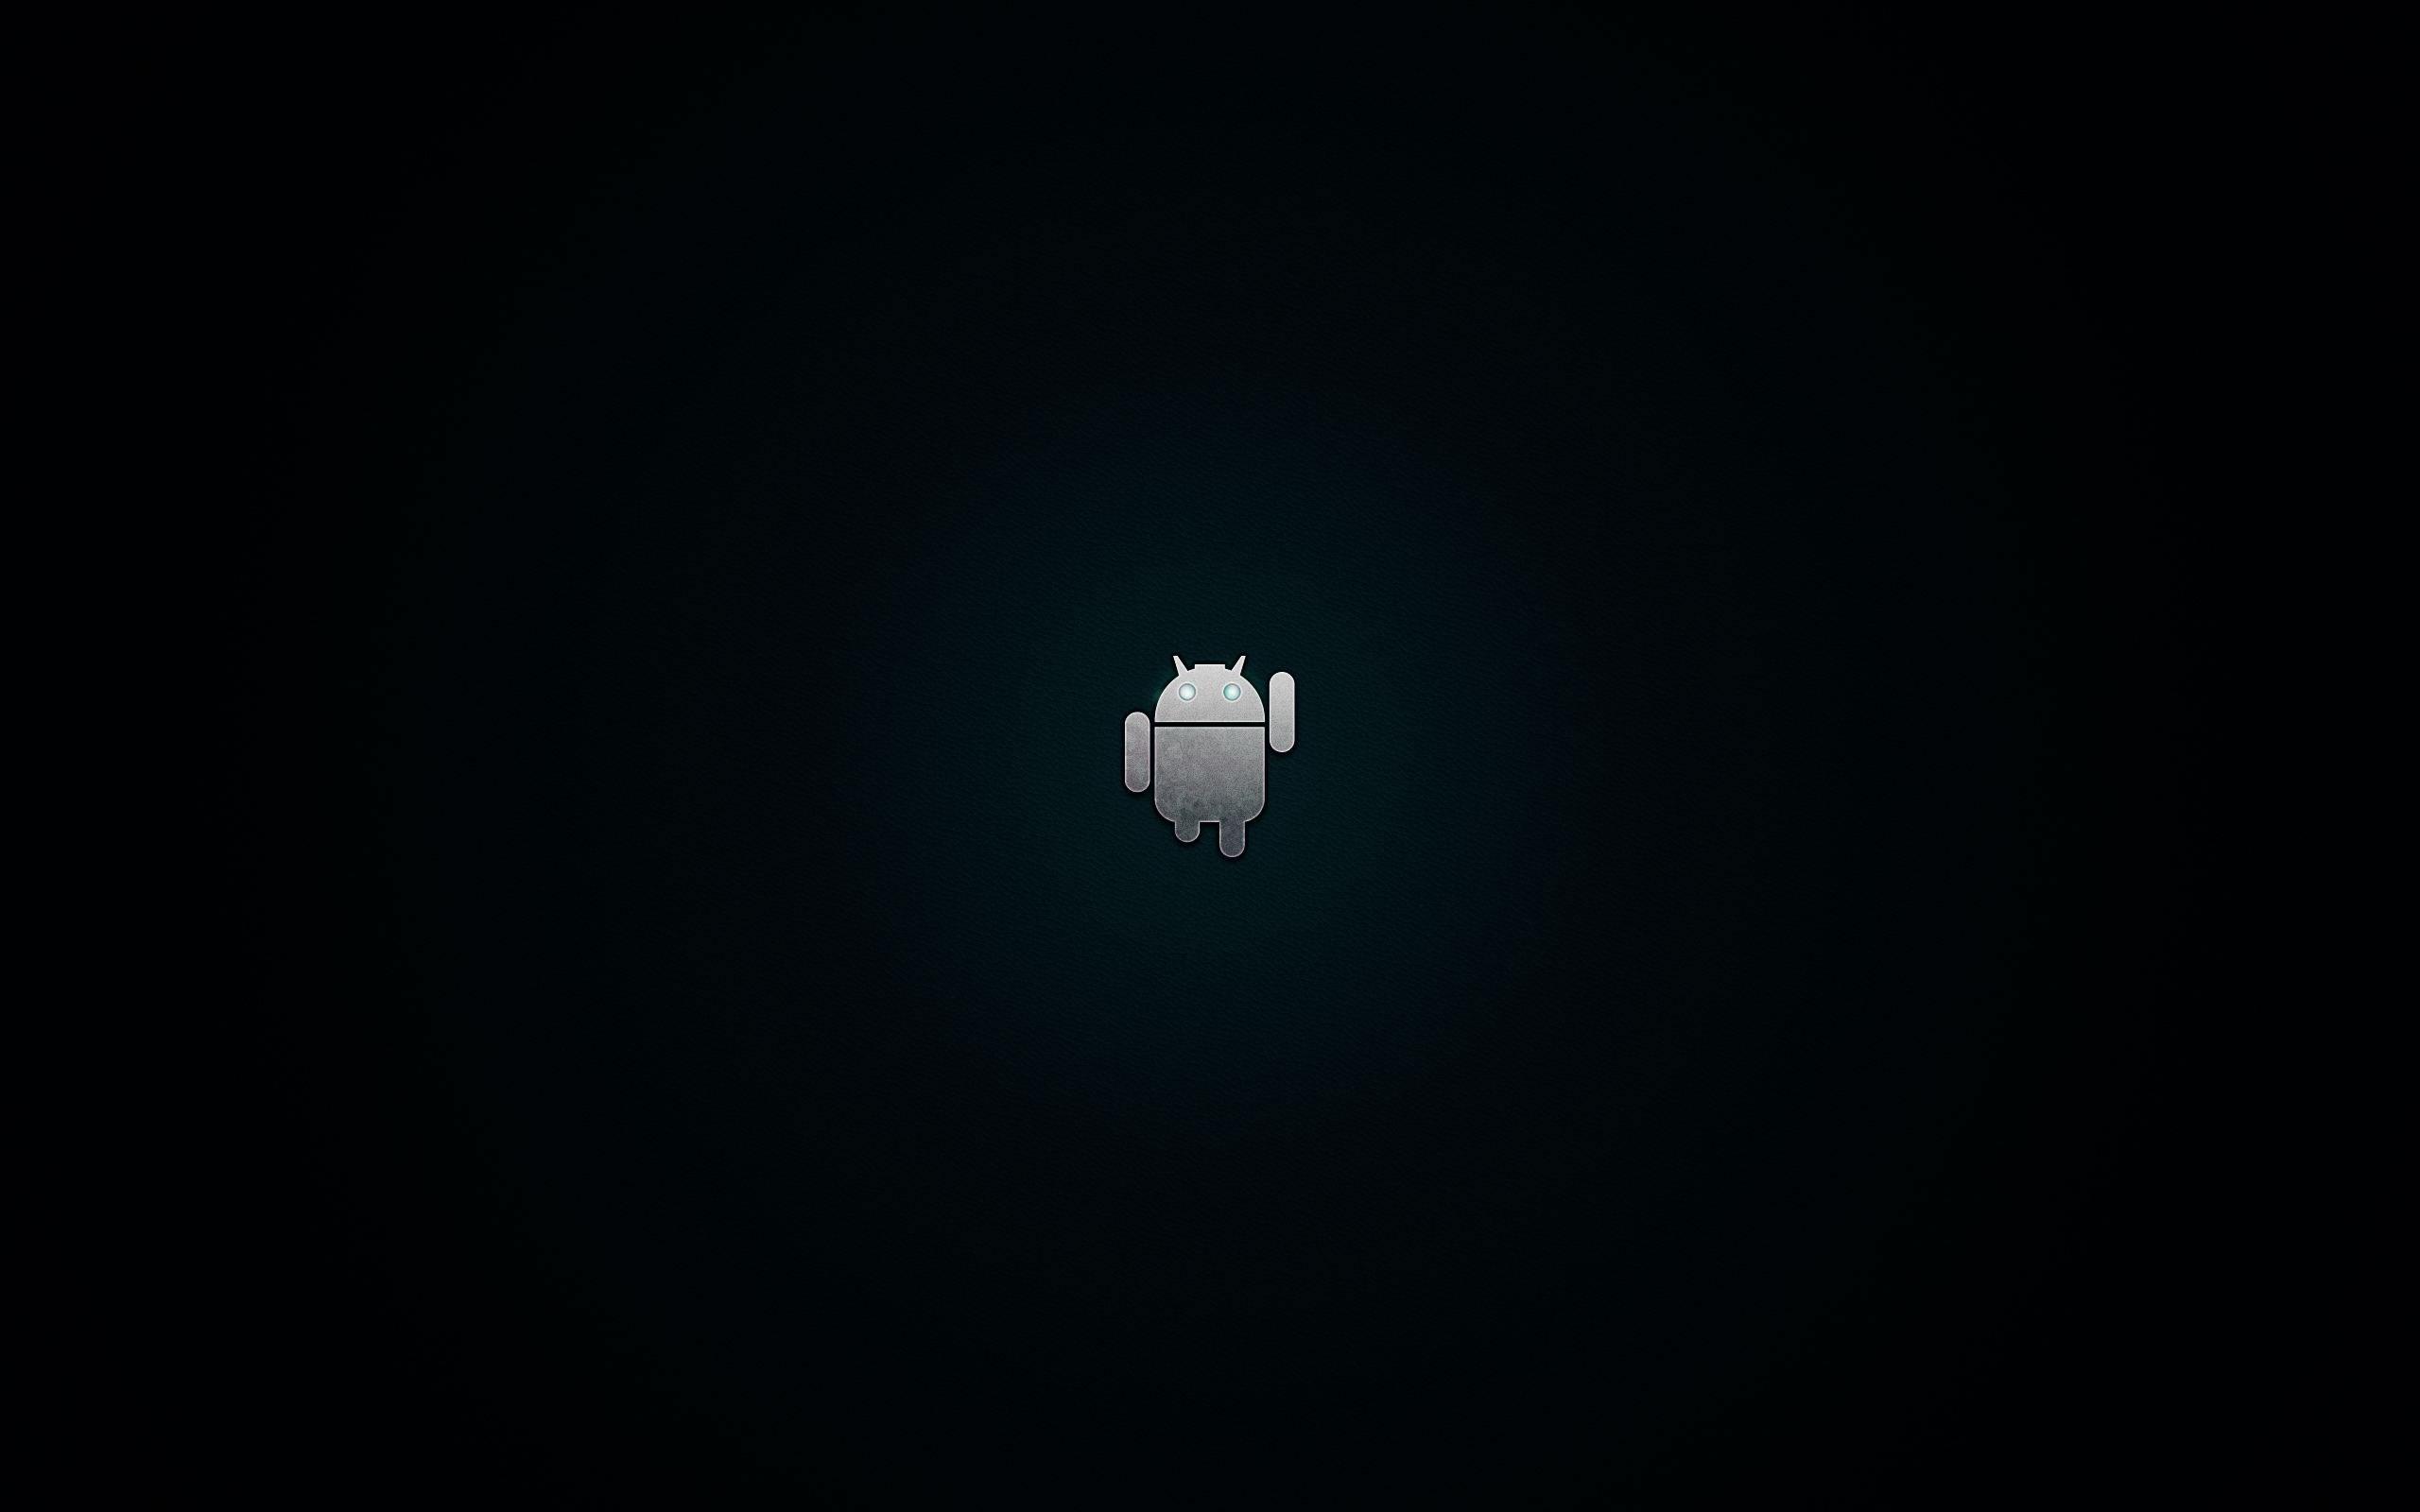 set android wallpaper to black wallpapersafari